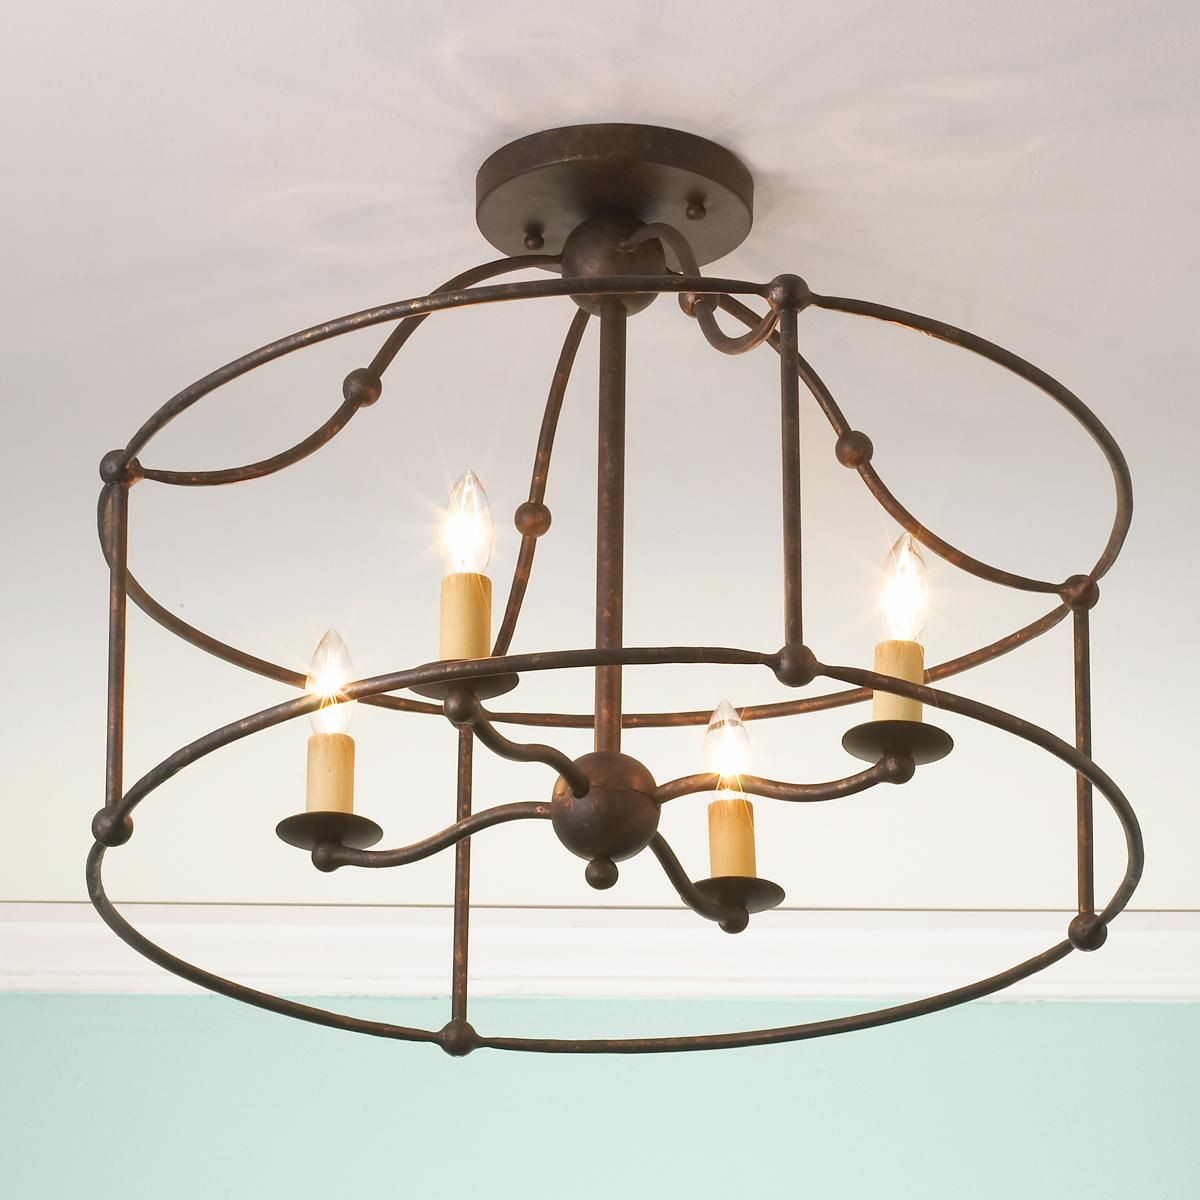 Wrought Iron Frame Ceiling Lantern Ceiling Light Wrought Iron Ceiling And Ceilings